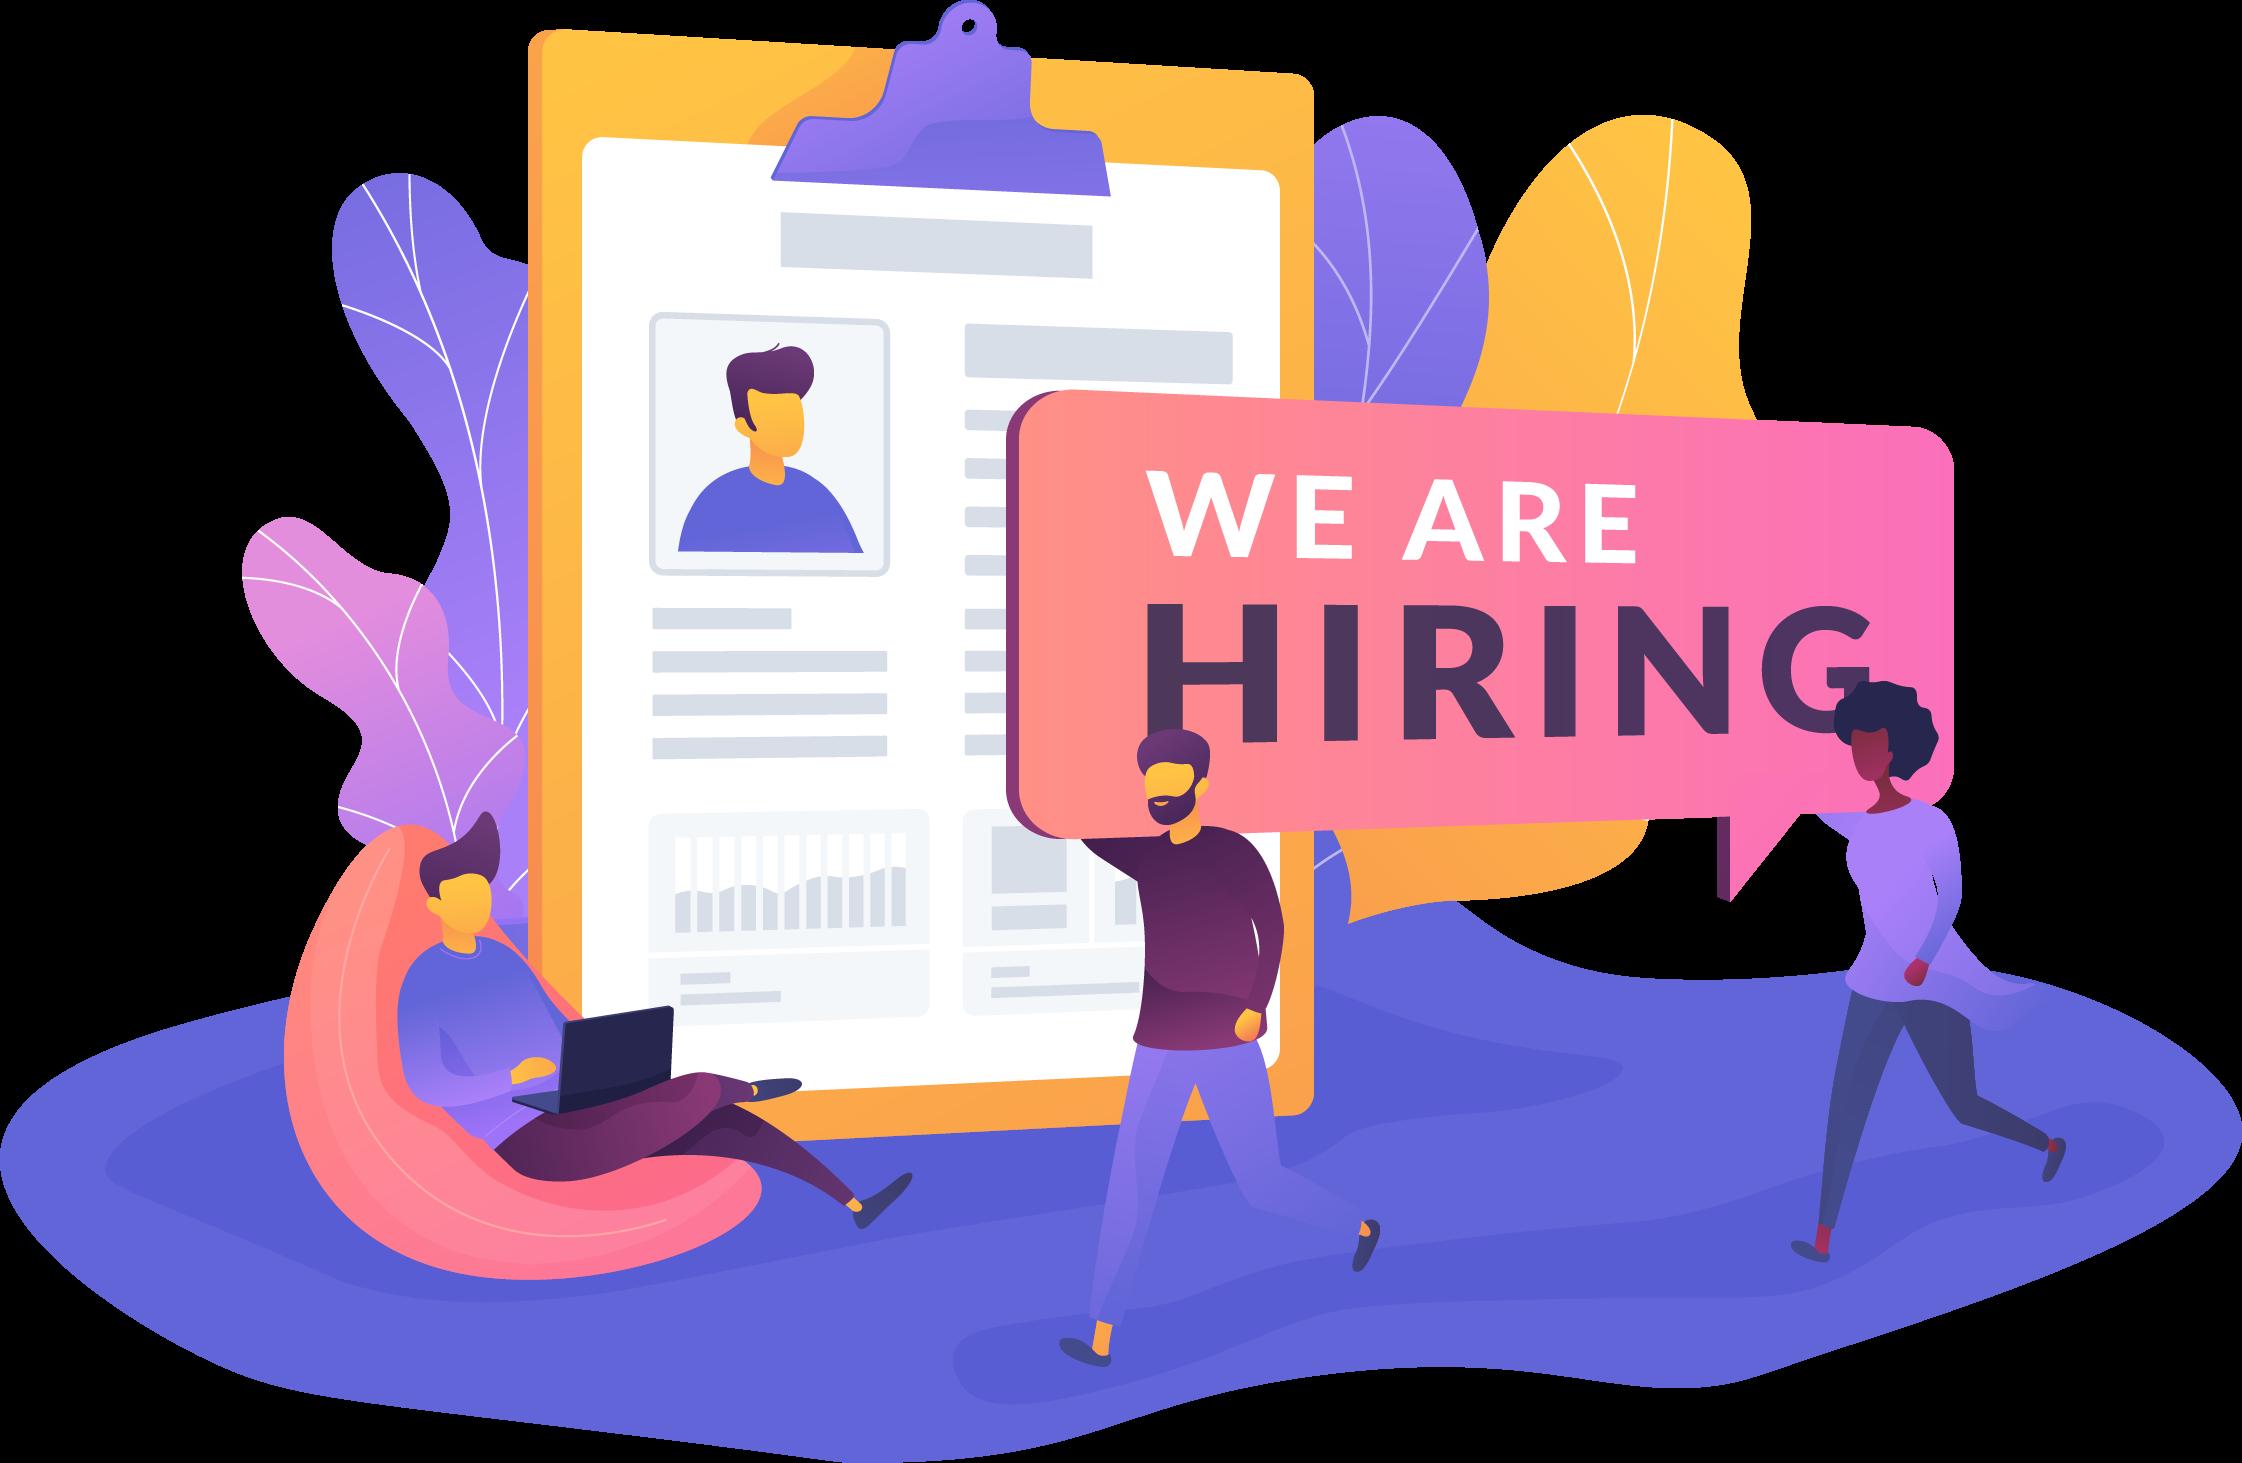 job hunt, work, career opportunities, software development company, data analytics, business analytics, hiring, open for work